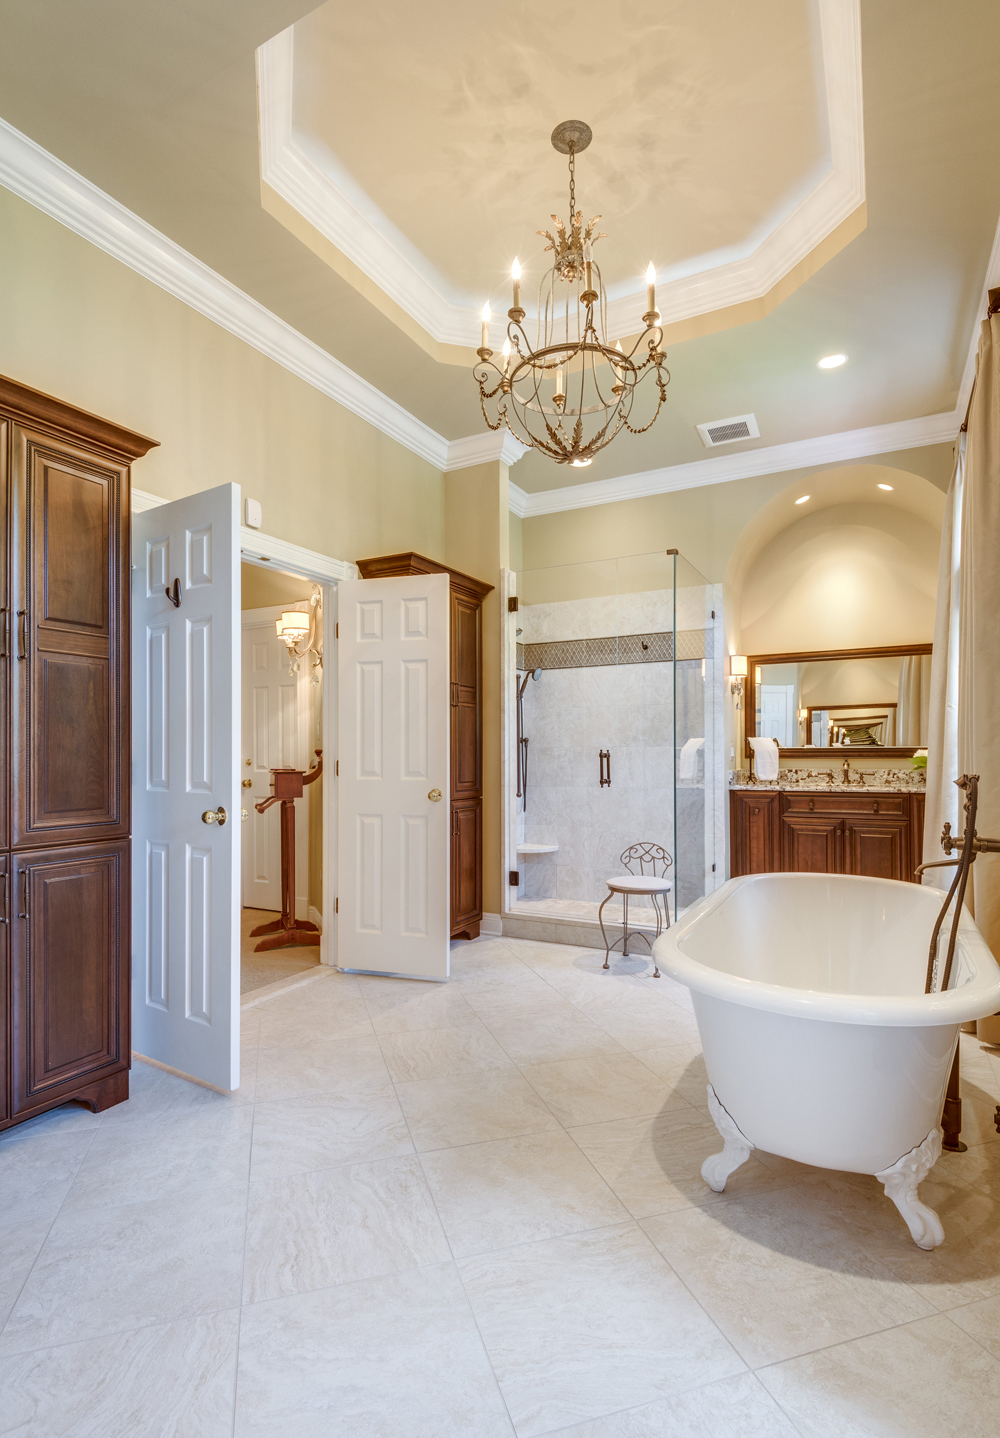 Design Build Master Bath Renovation In Great Falls VA